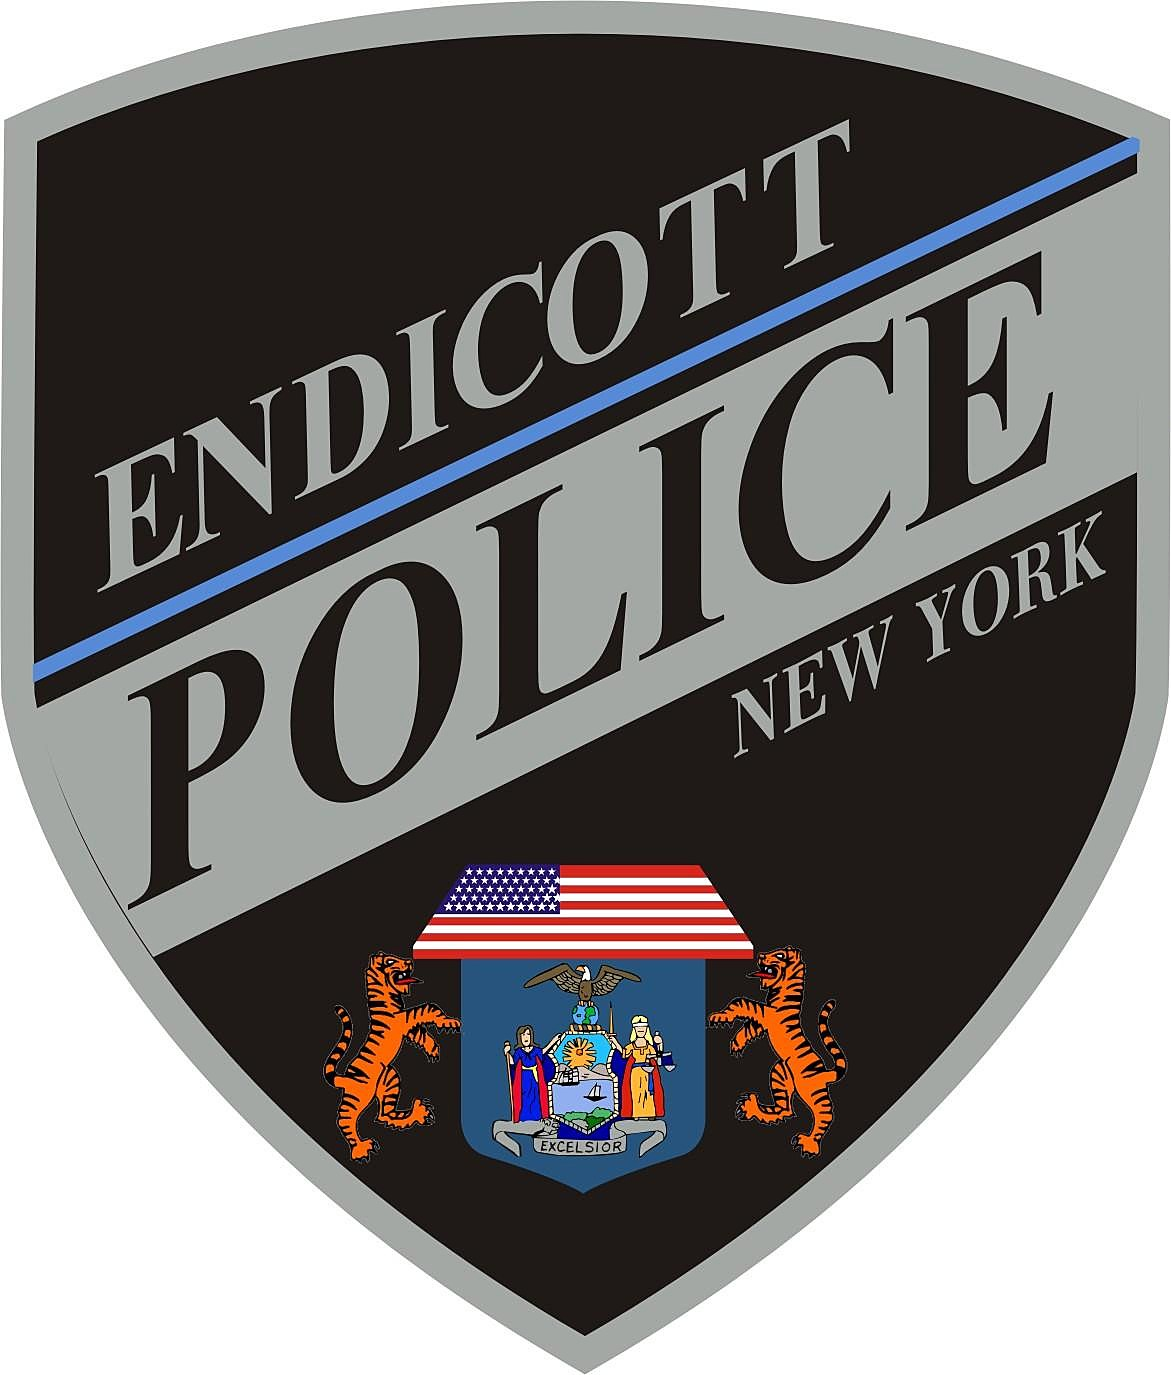 Endicott Police Photo